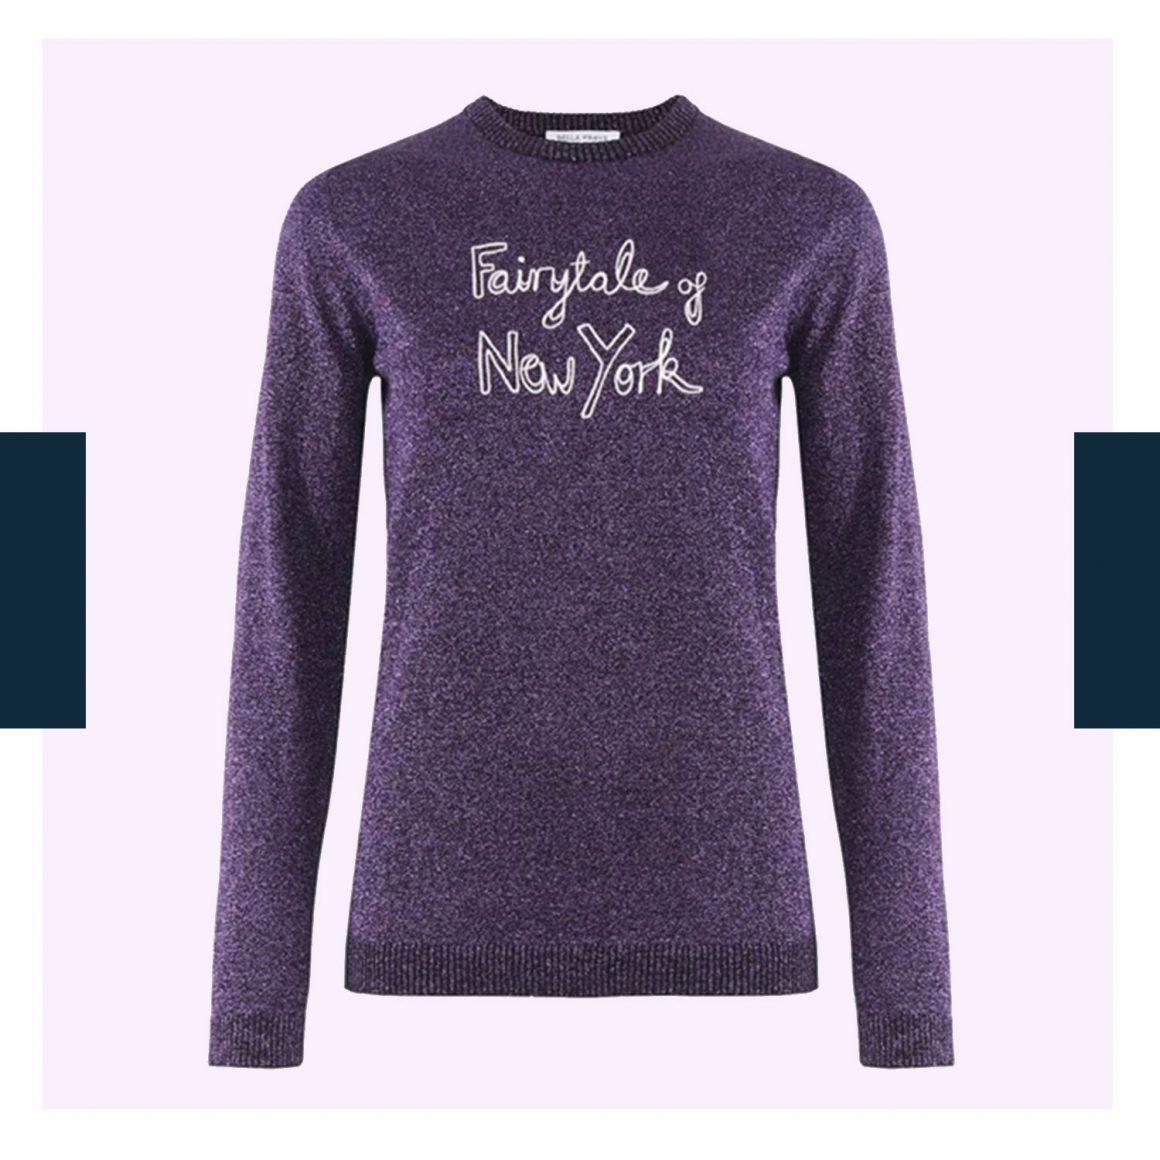 Le pull Fairytale of New York de Bella Freud